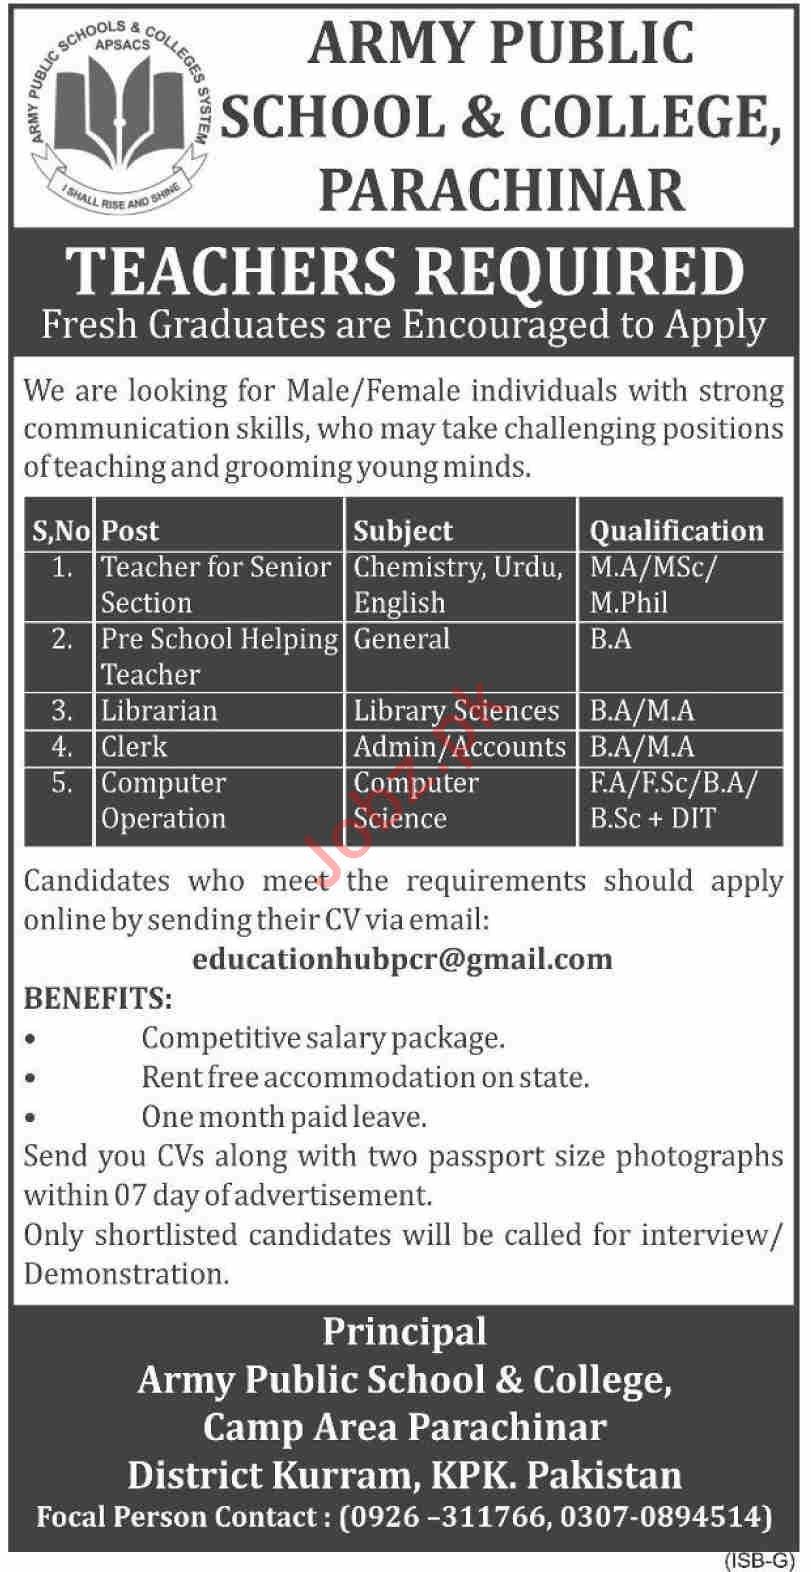 Army Public School & College Camp Area Parachinar Jobs 2019